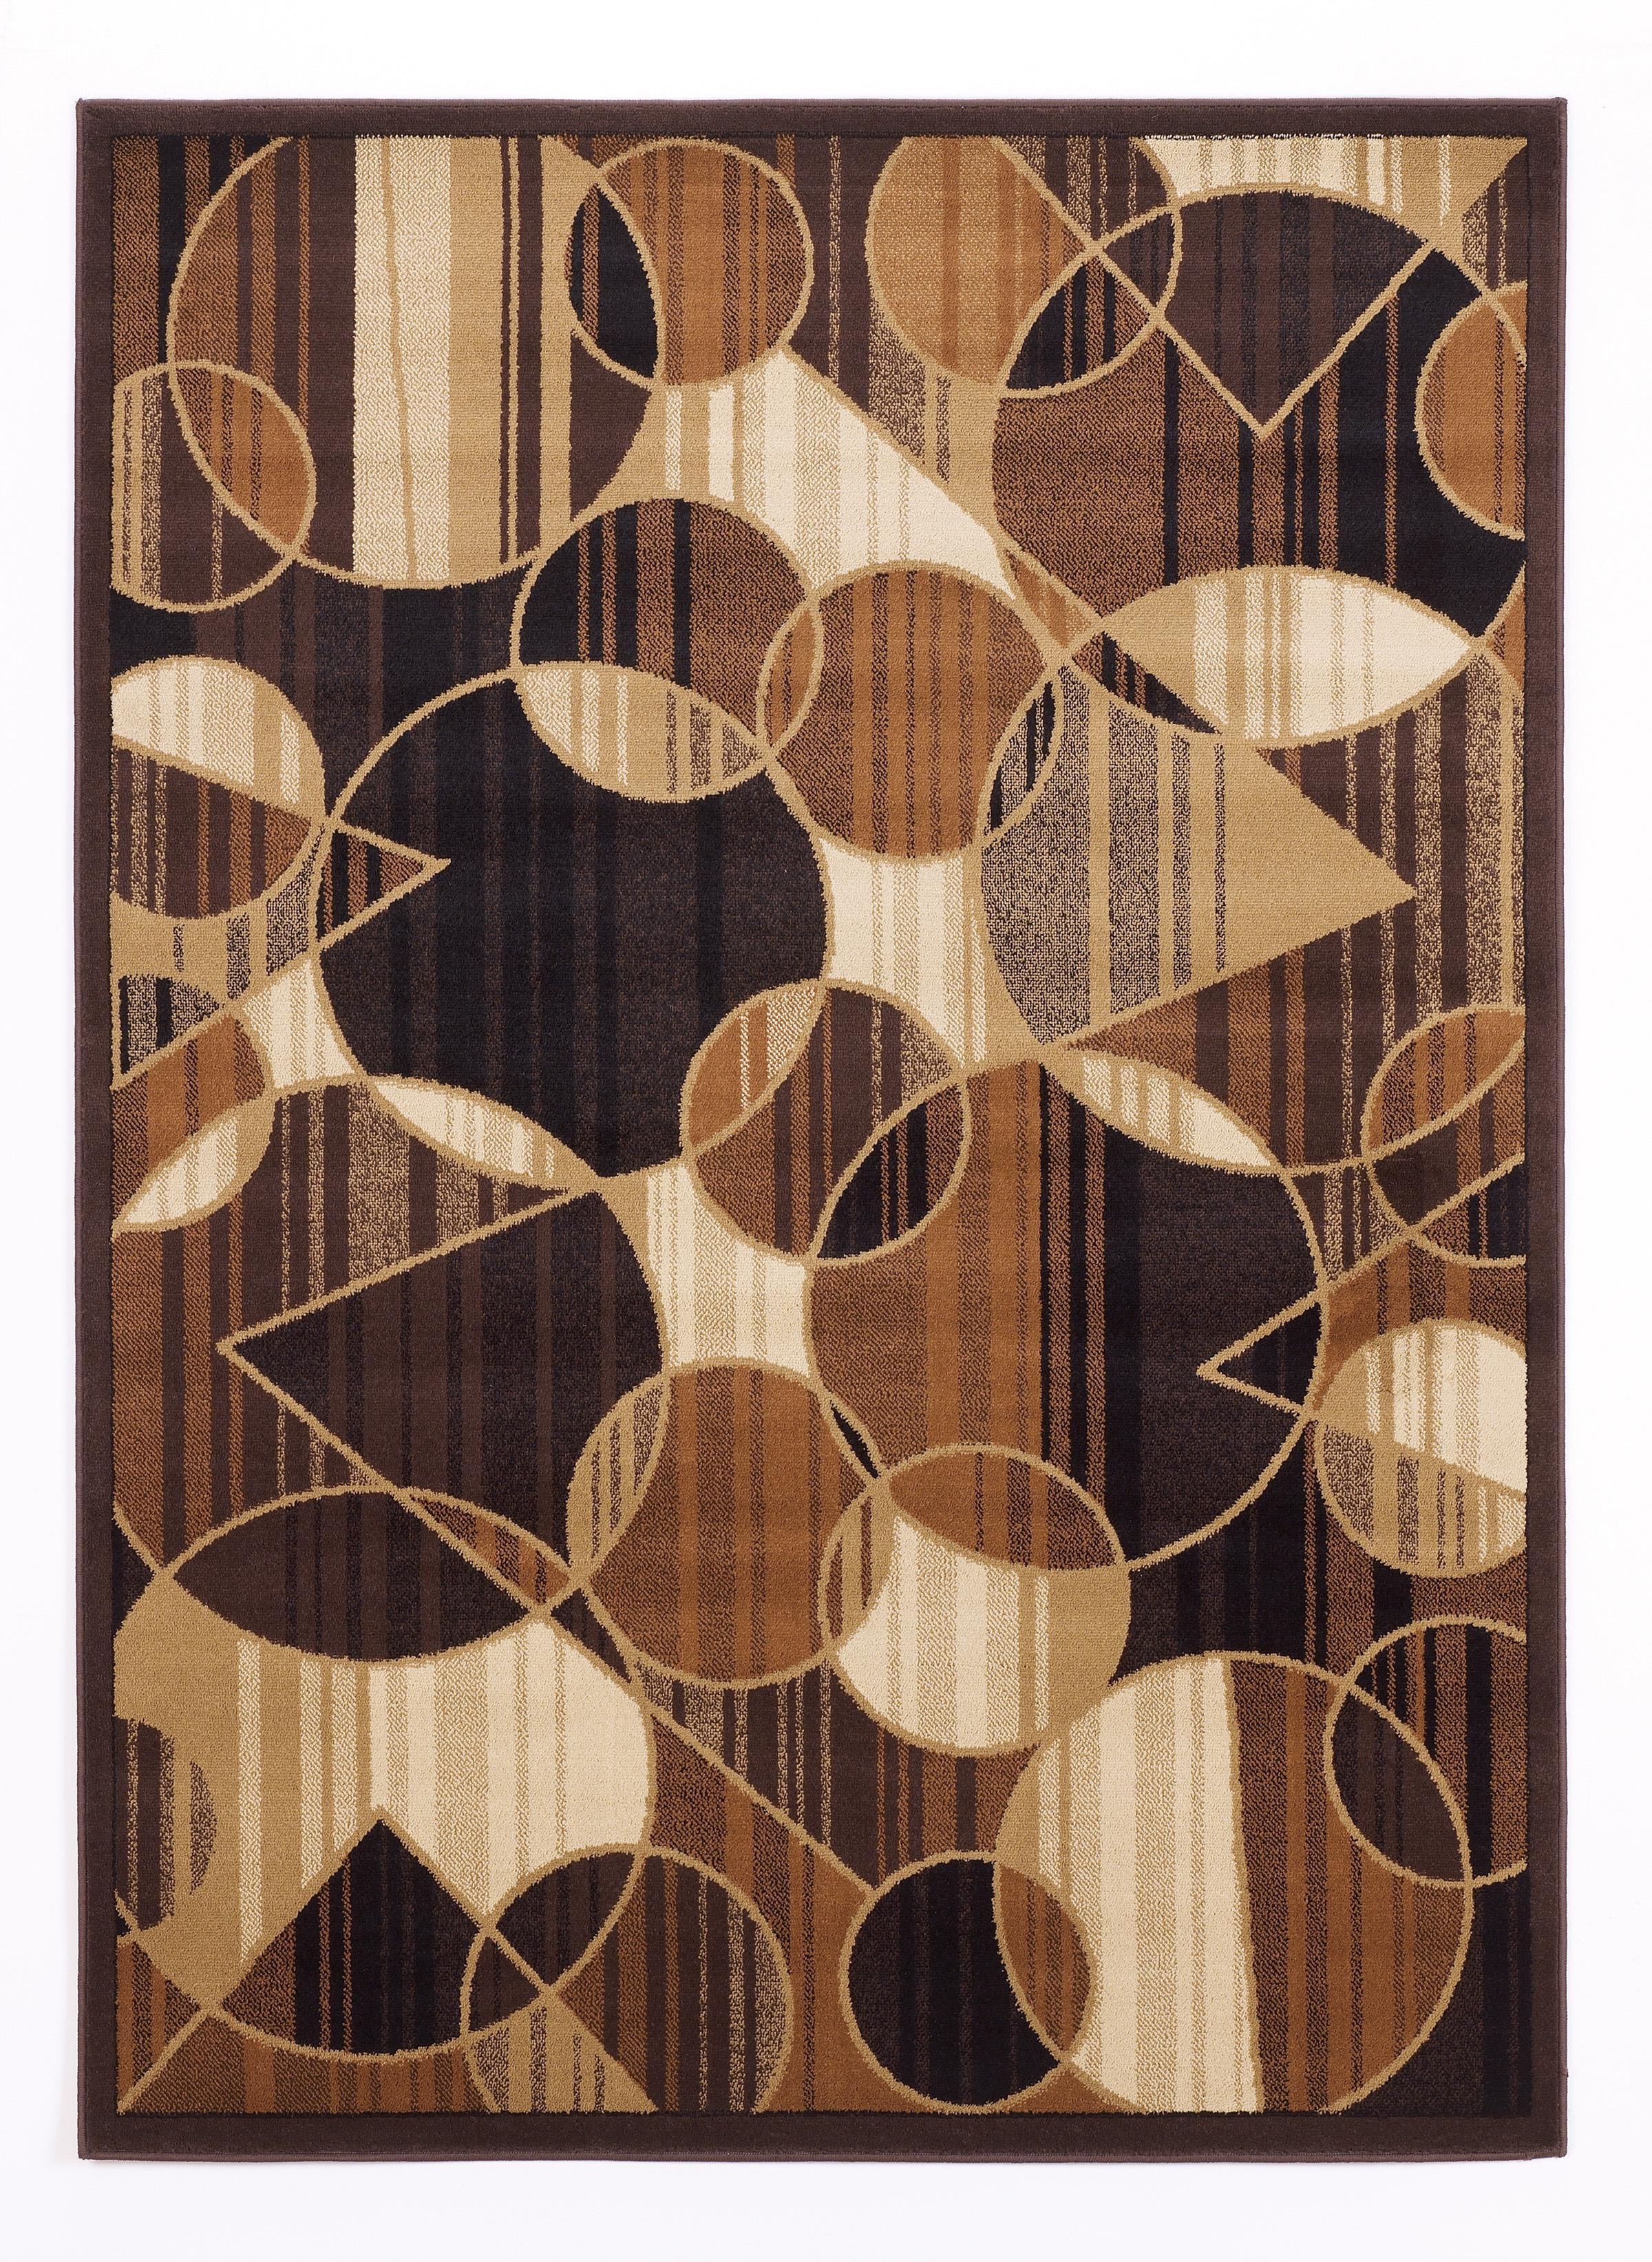 Signature Design by Ashley Contemporary Area Rugs Calder - Multi Rug - Item Number: R135012